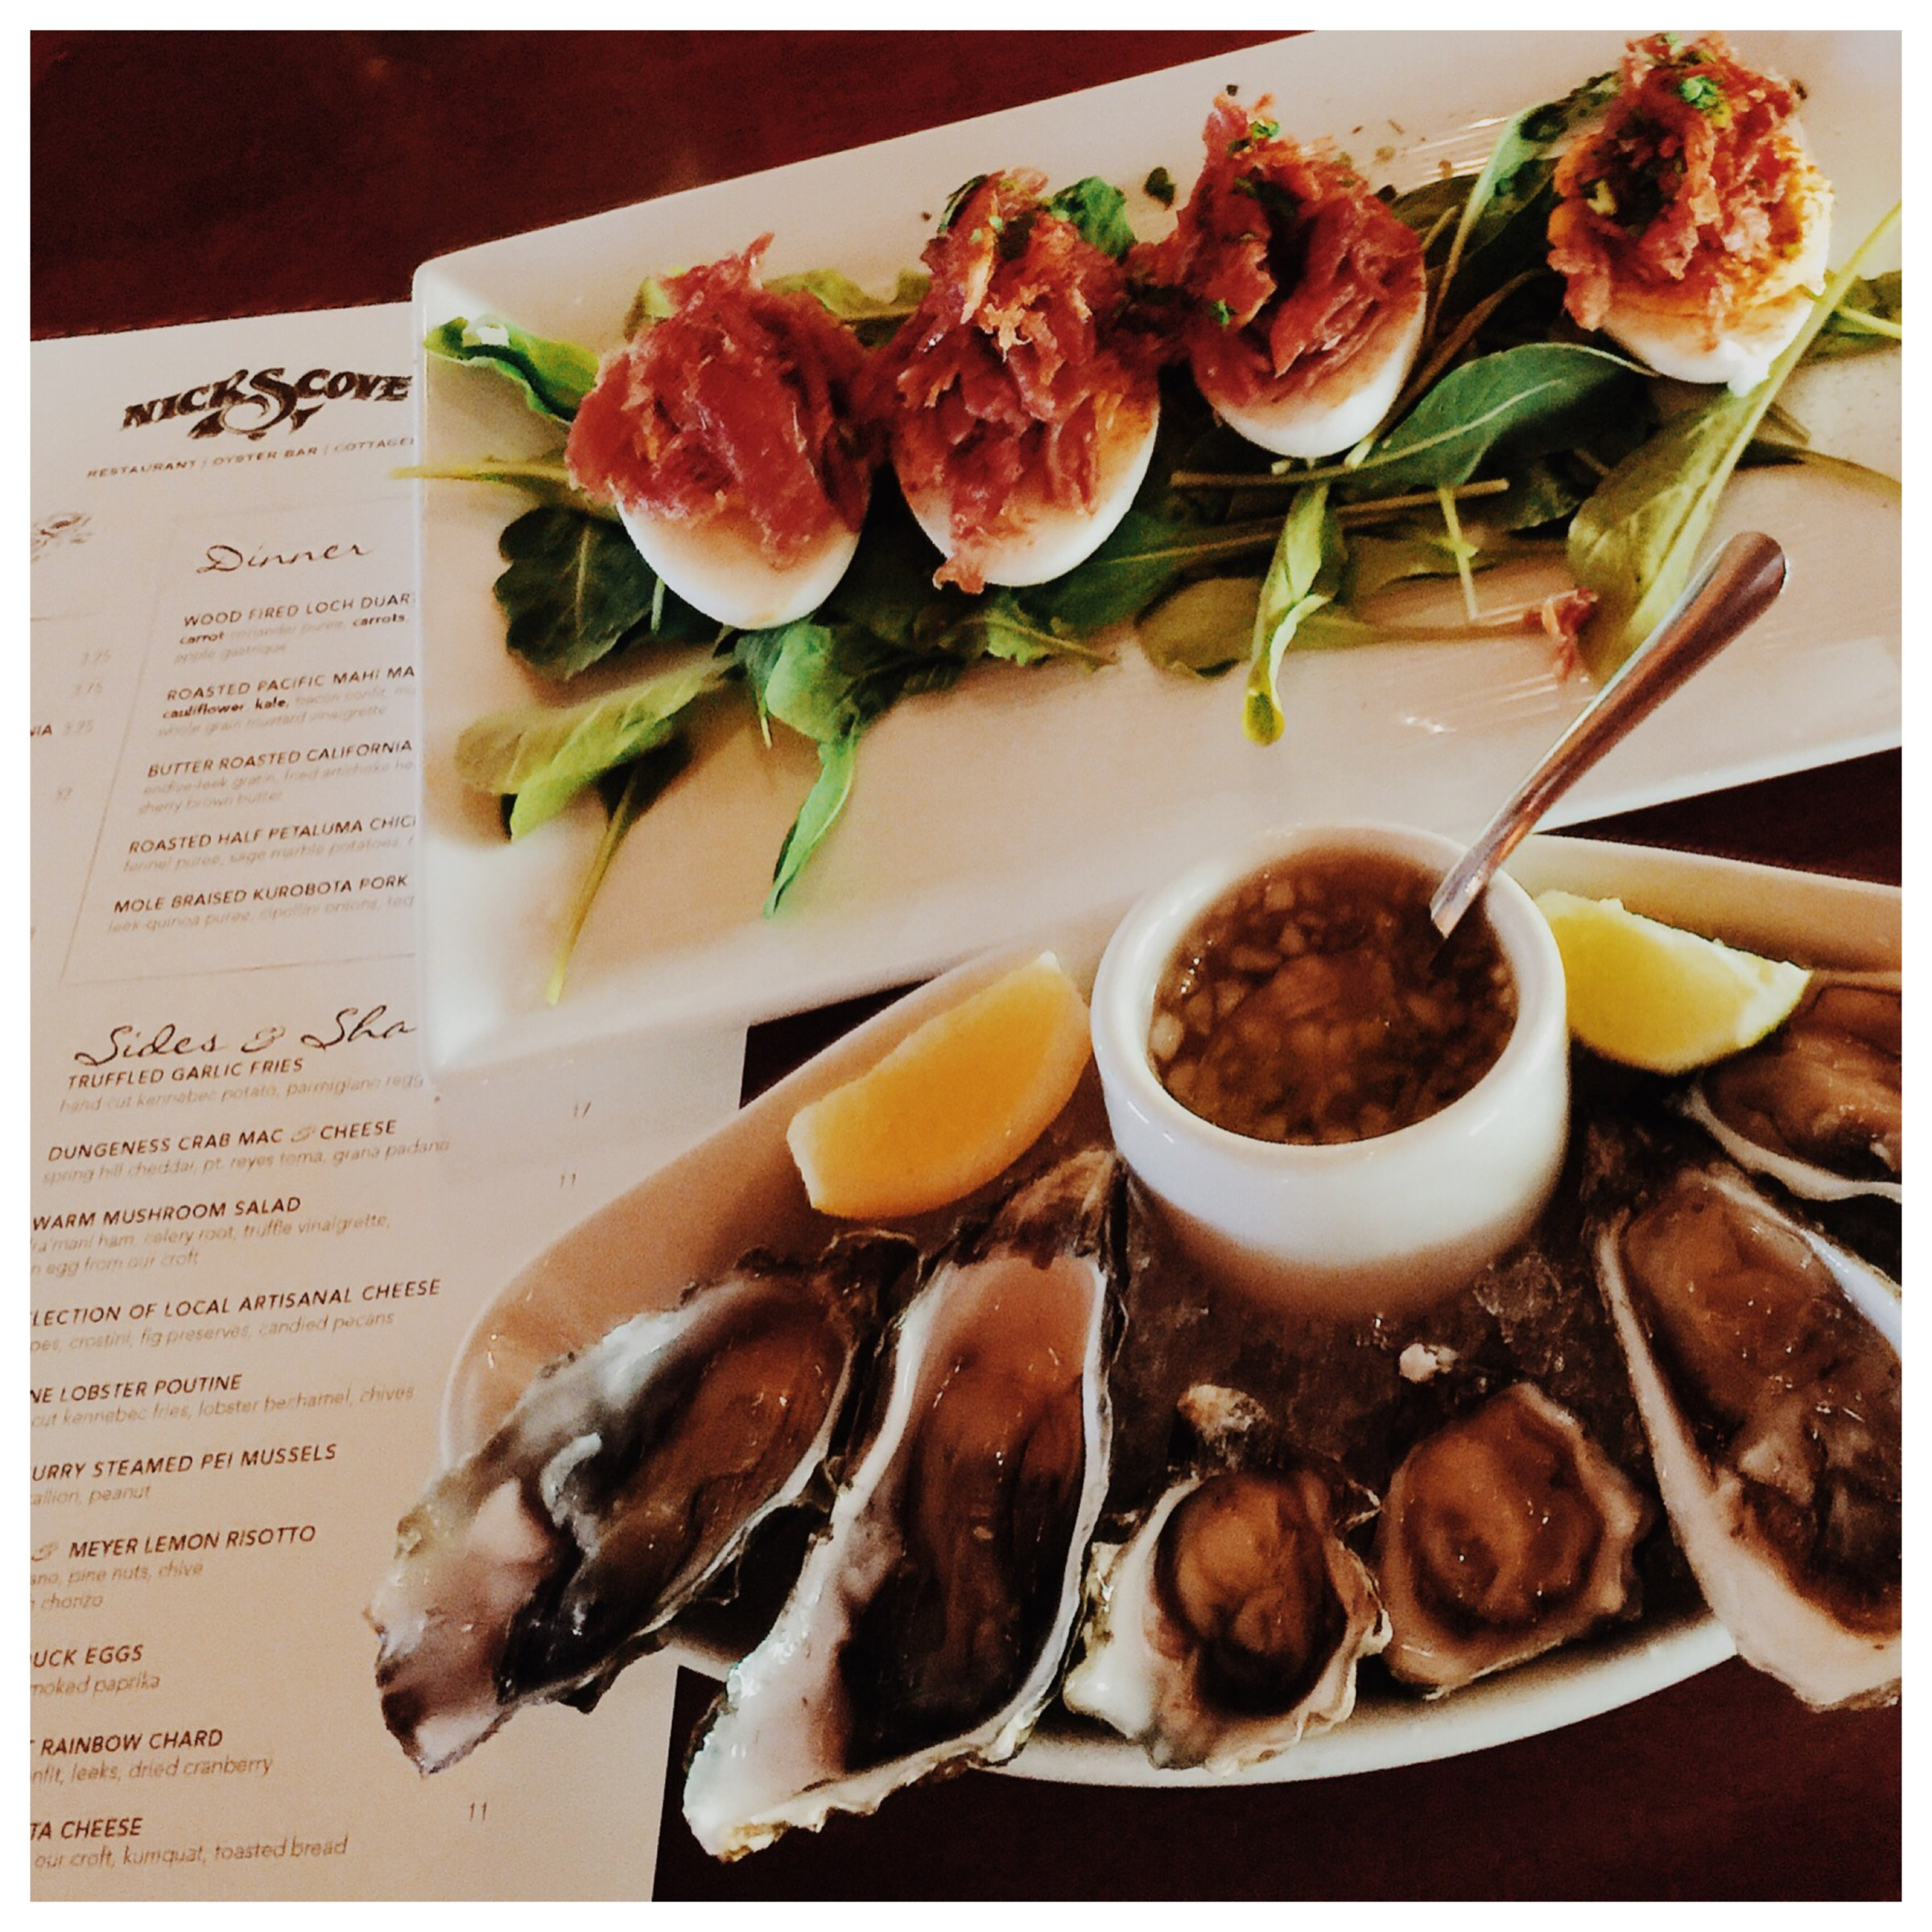 Oysters et al